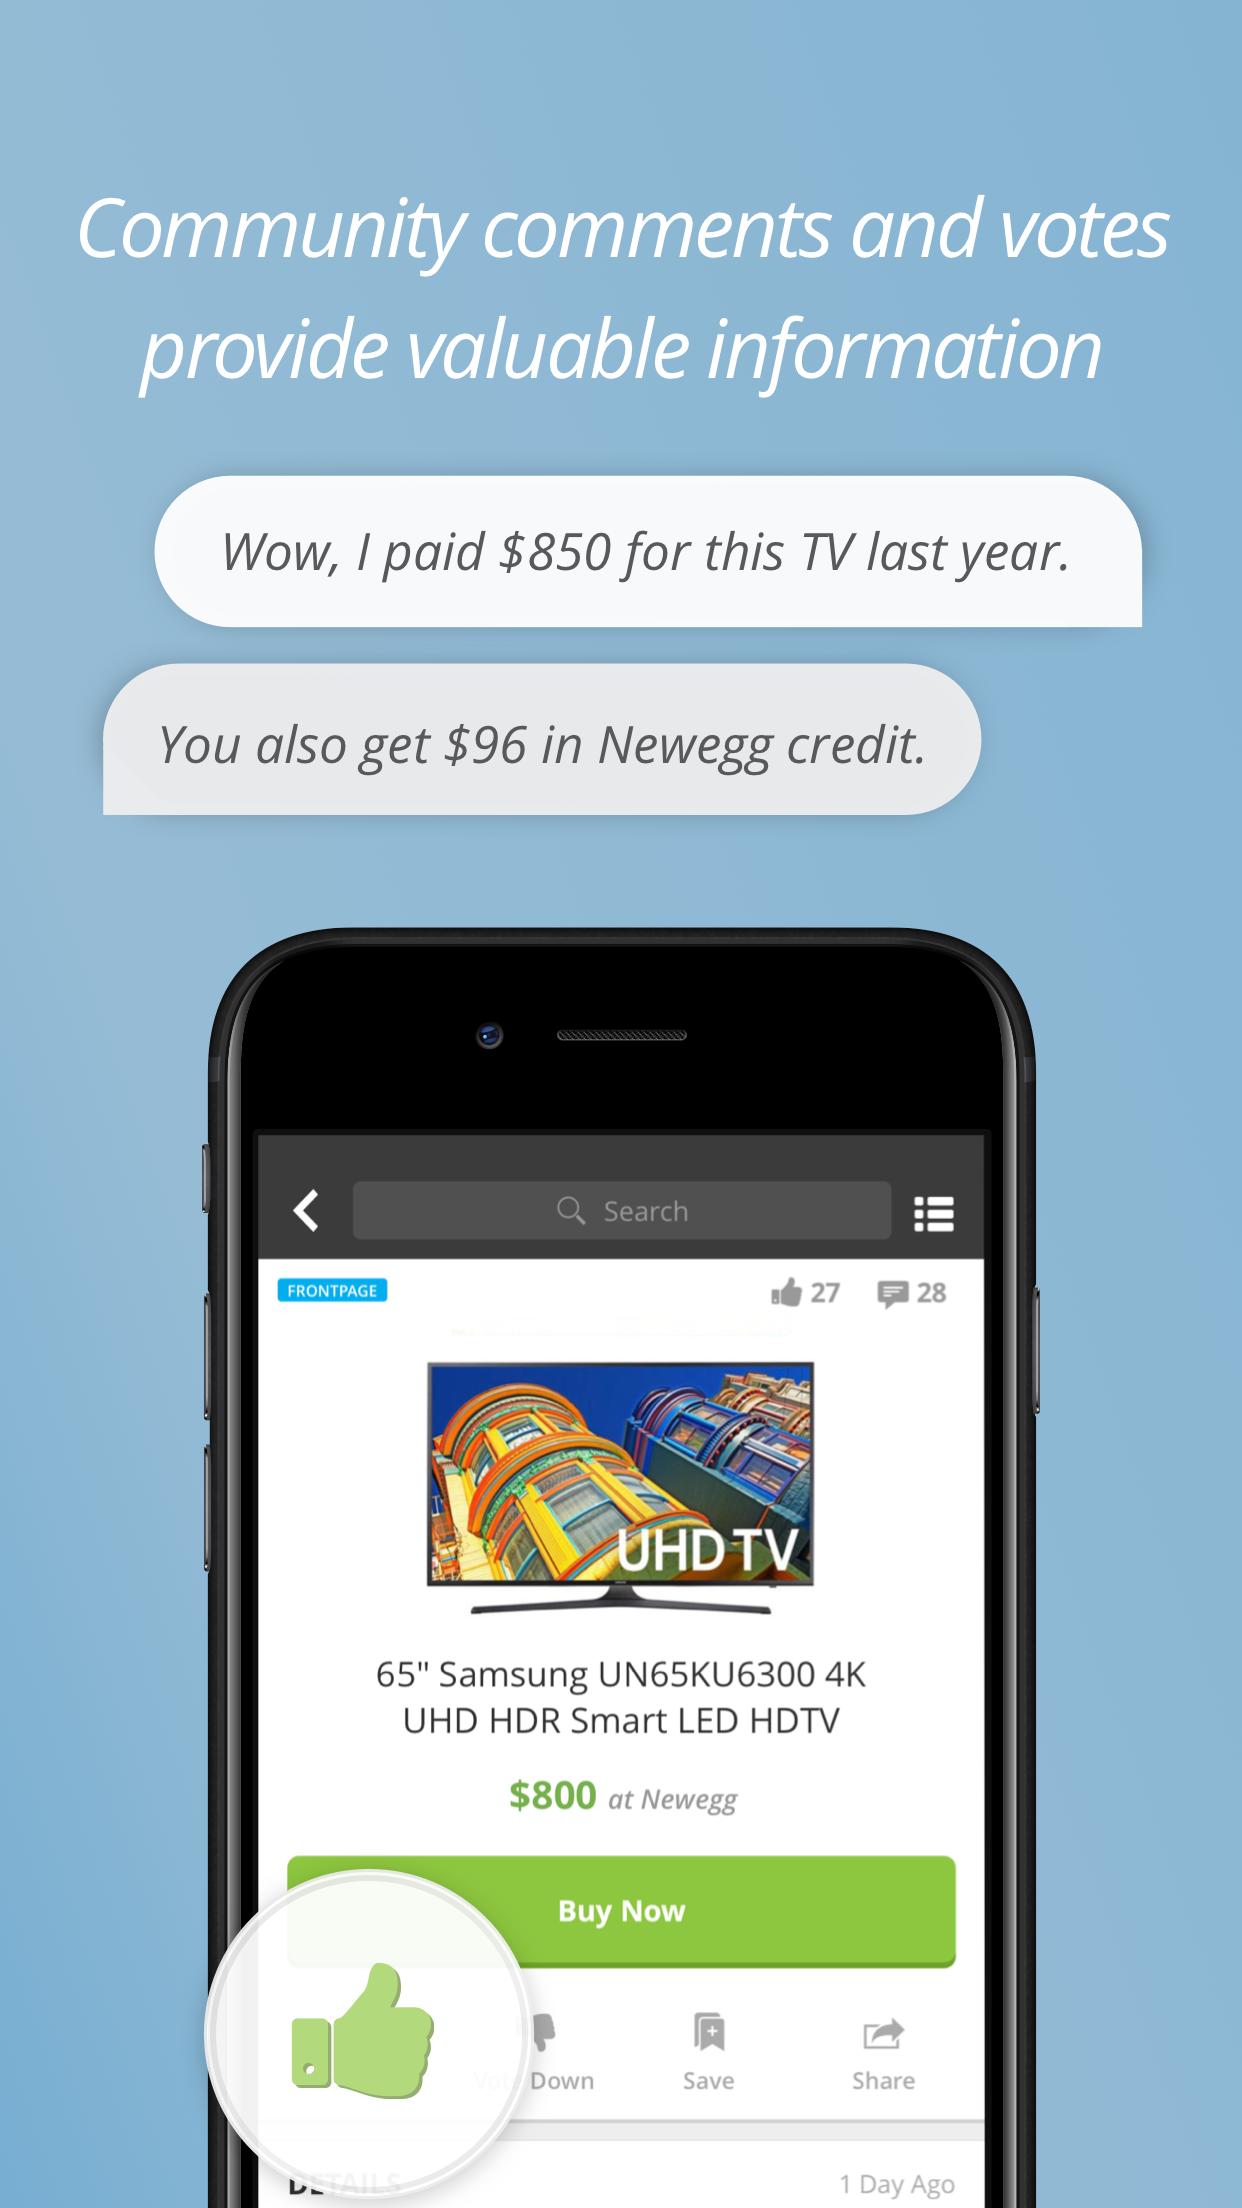 Slickdeals: Coupons & Shopping Screenshot